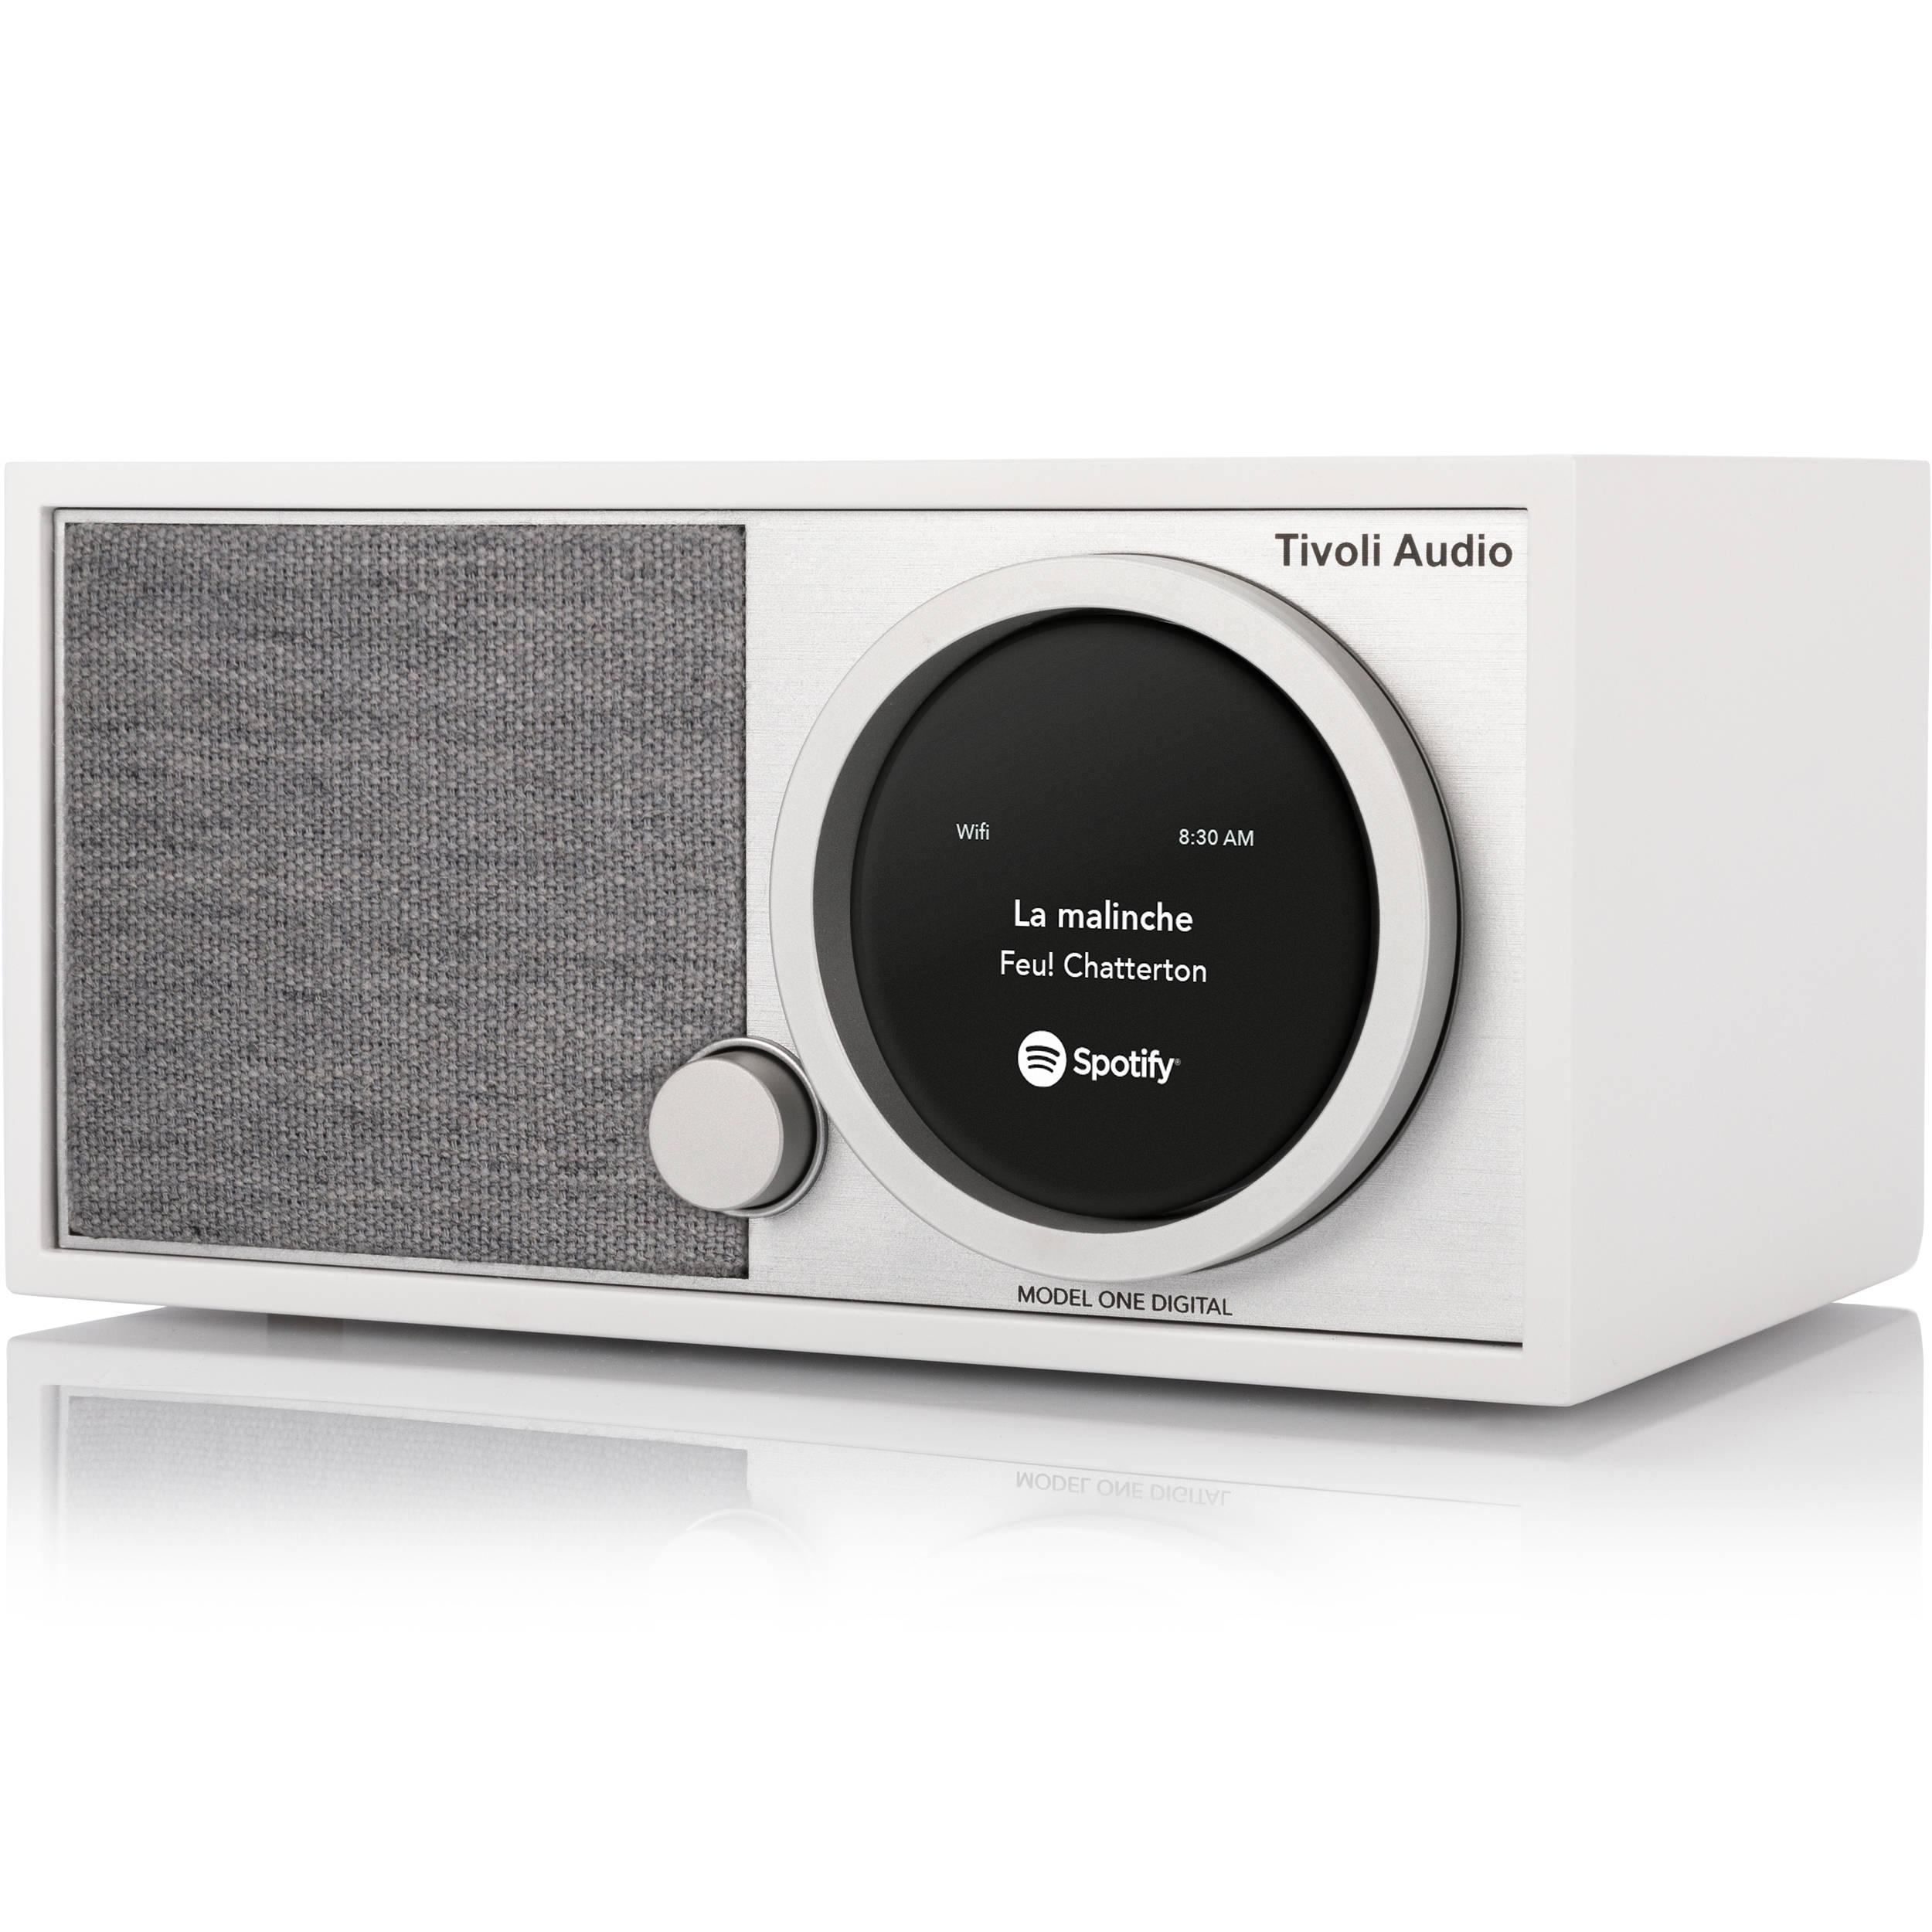 tivoli art collection model one digital radio white gray. Black Bedroom Furniture Sets. Home Design Ideas